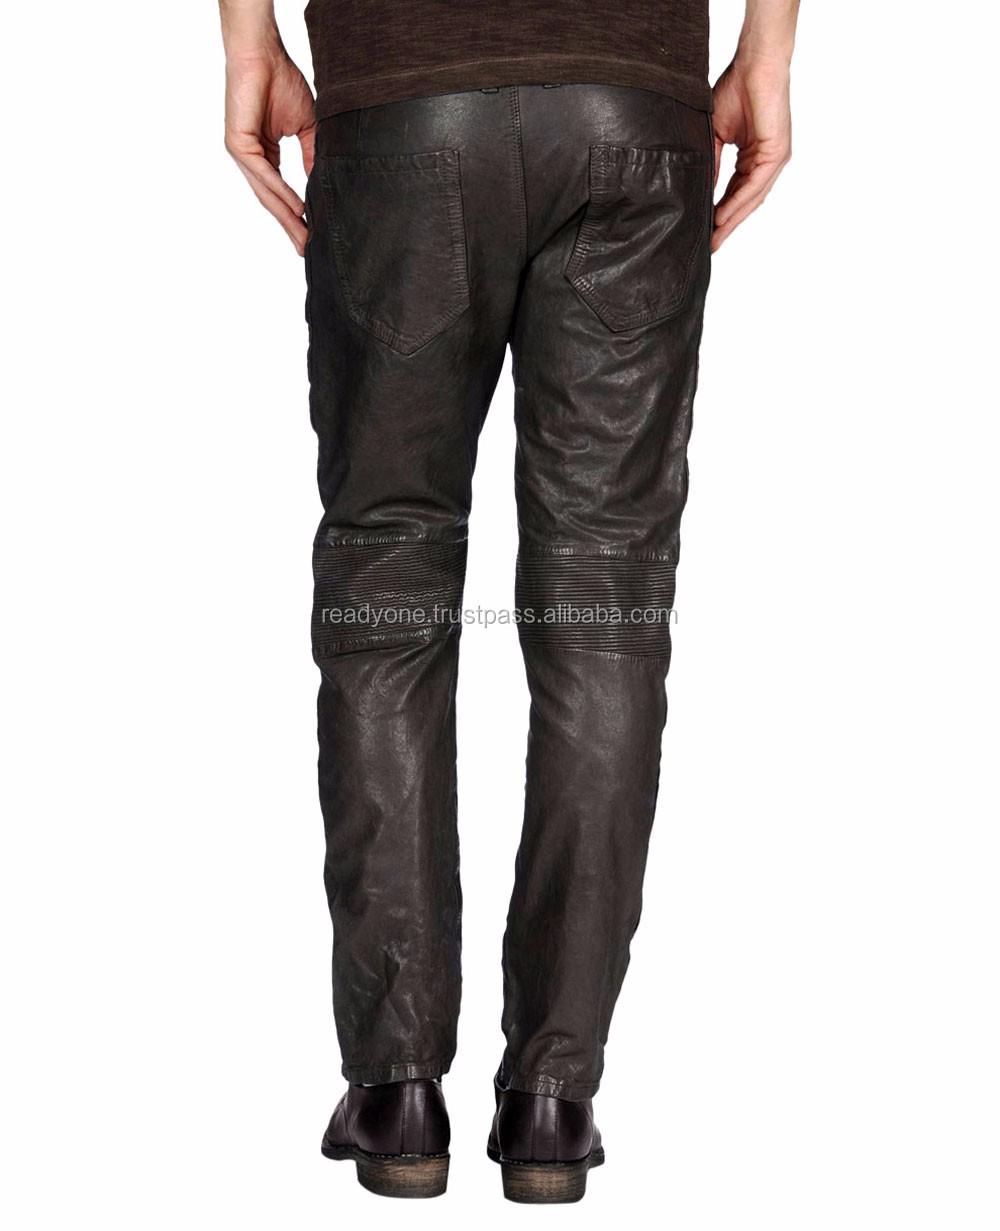 d0e99438cfccff Custom Mens Leather Pants Men Black Leather Biker Pants Sexy Leather Pants  Men Wholesale